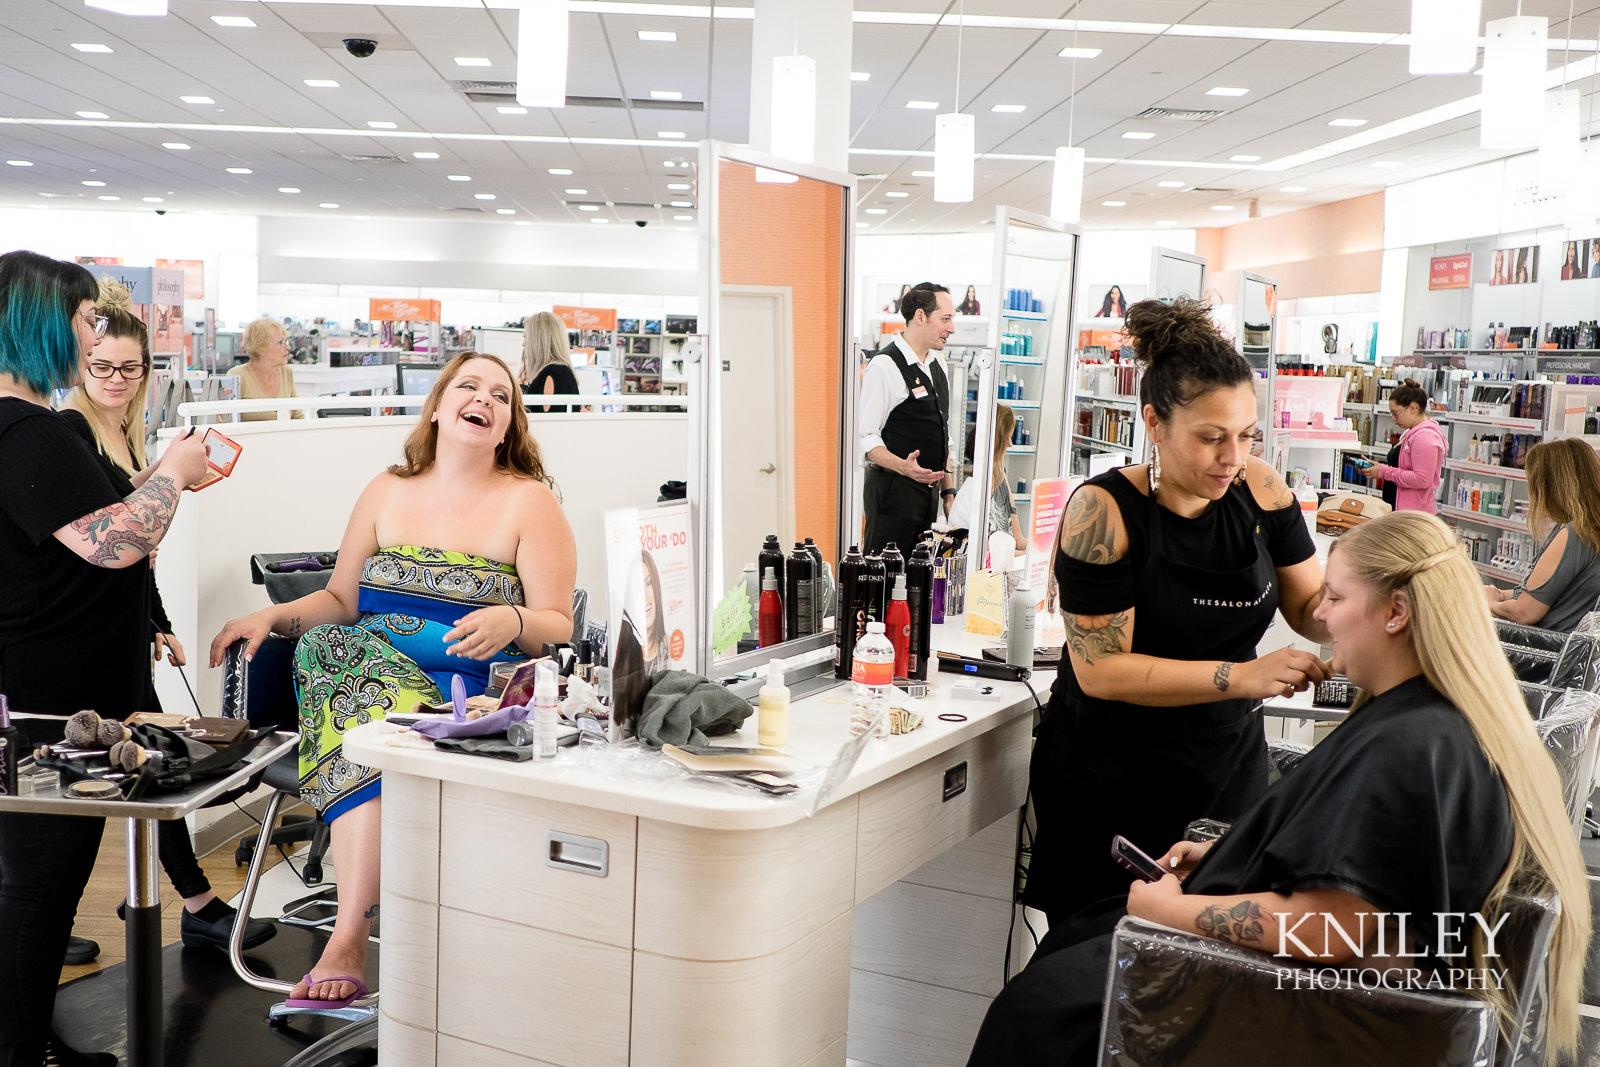 001 - Ulta Beauty Wedding Hair and Makeup - Rochester NY - XT2A2646.jpg